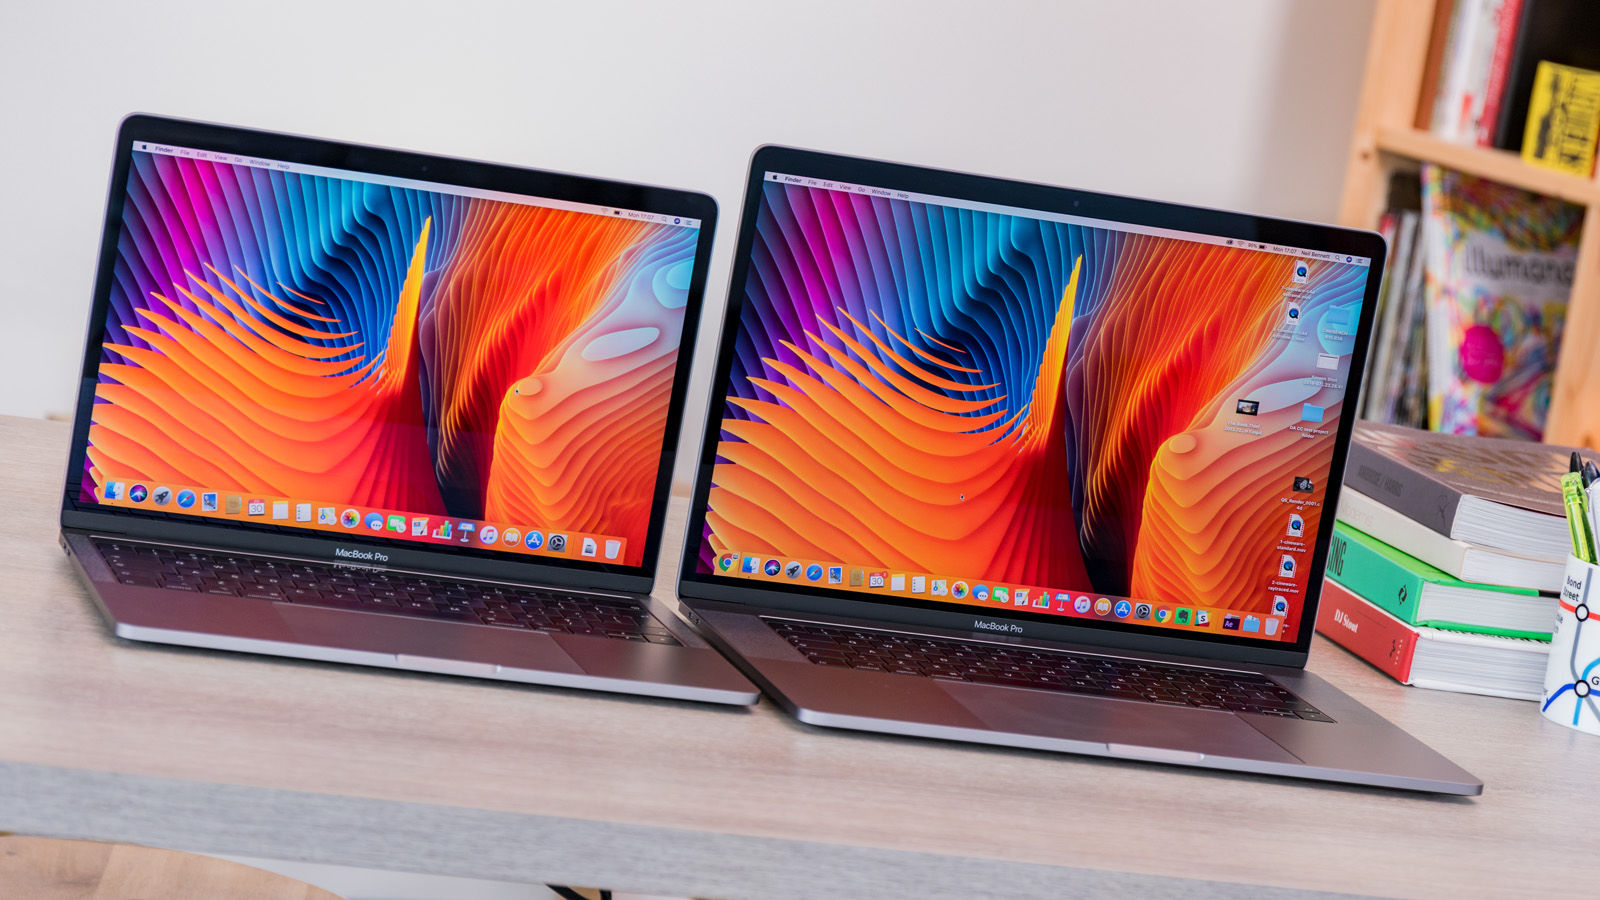 Design of MacBook Pro